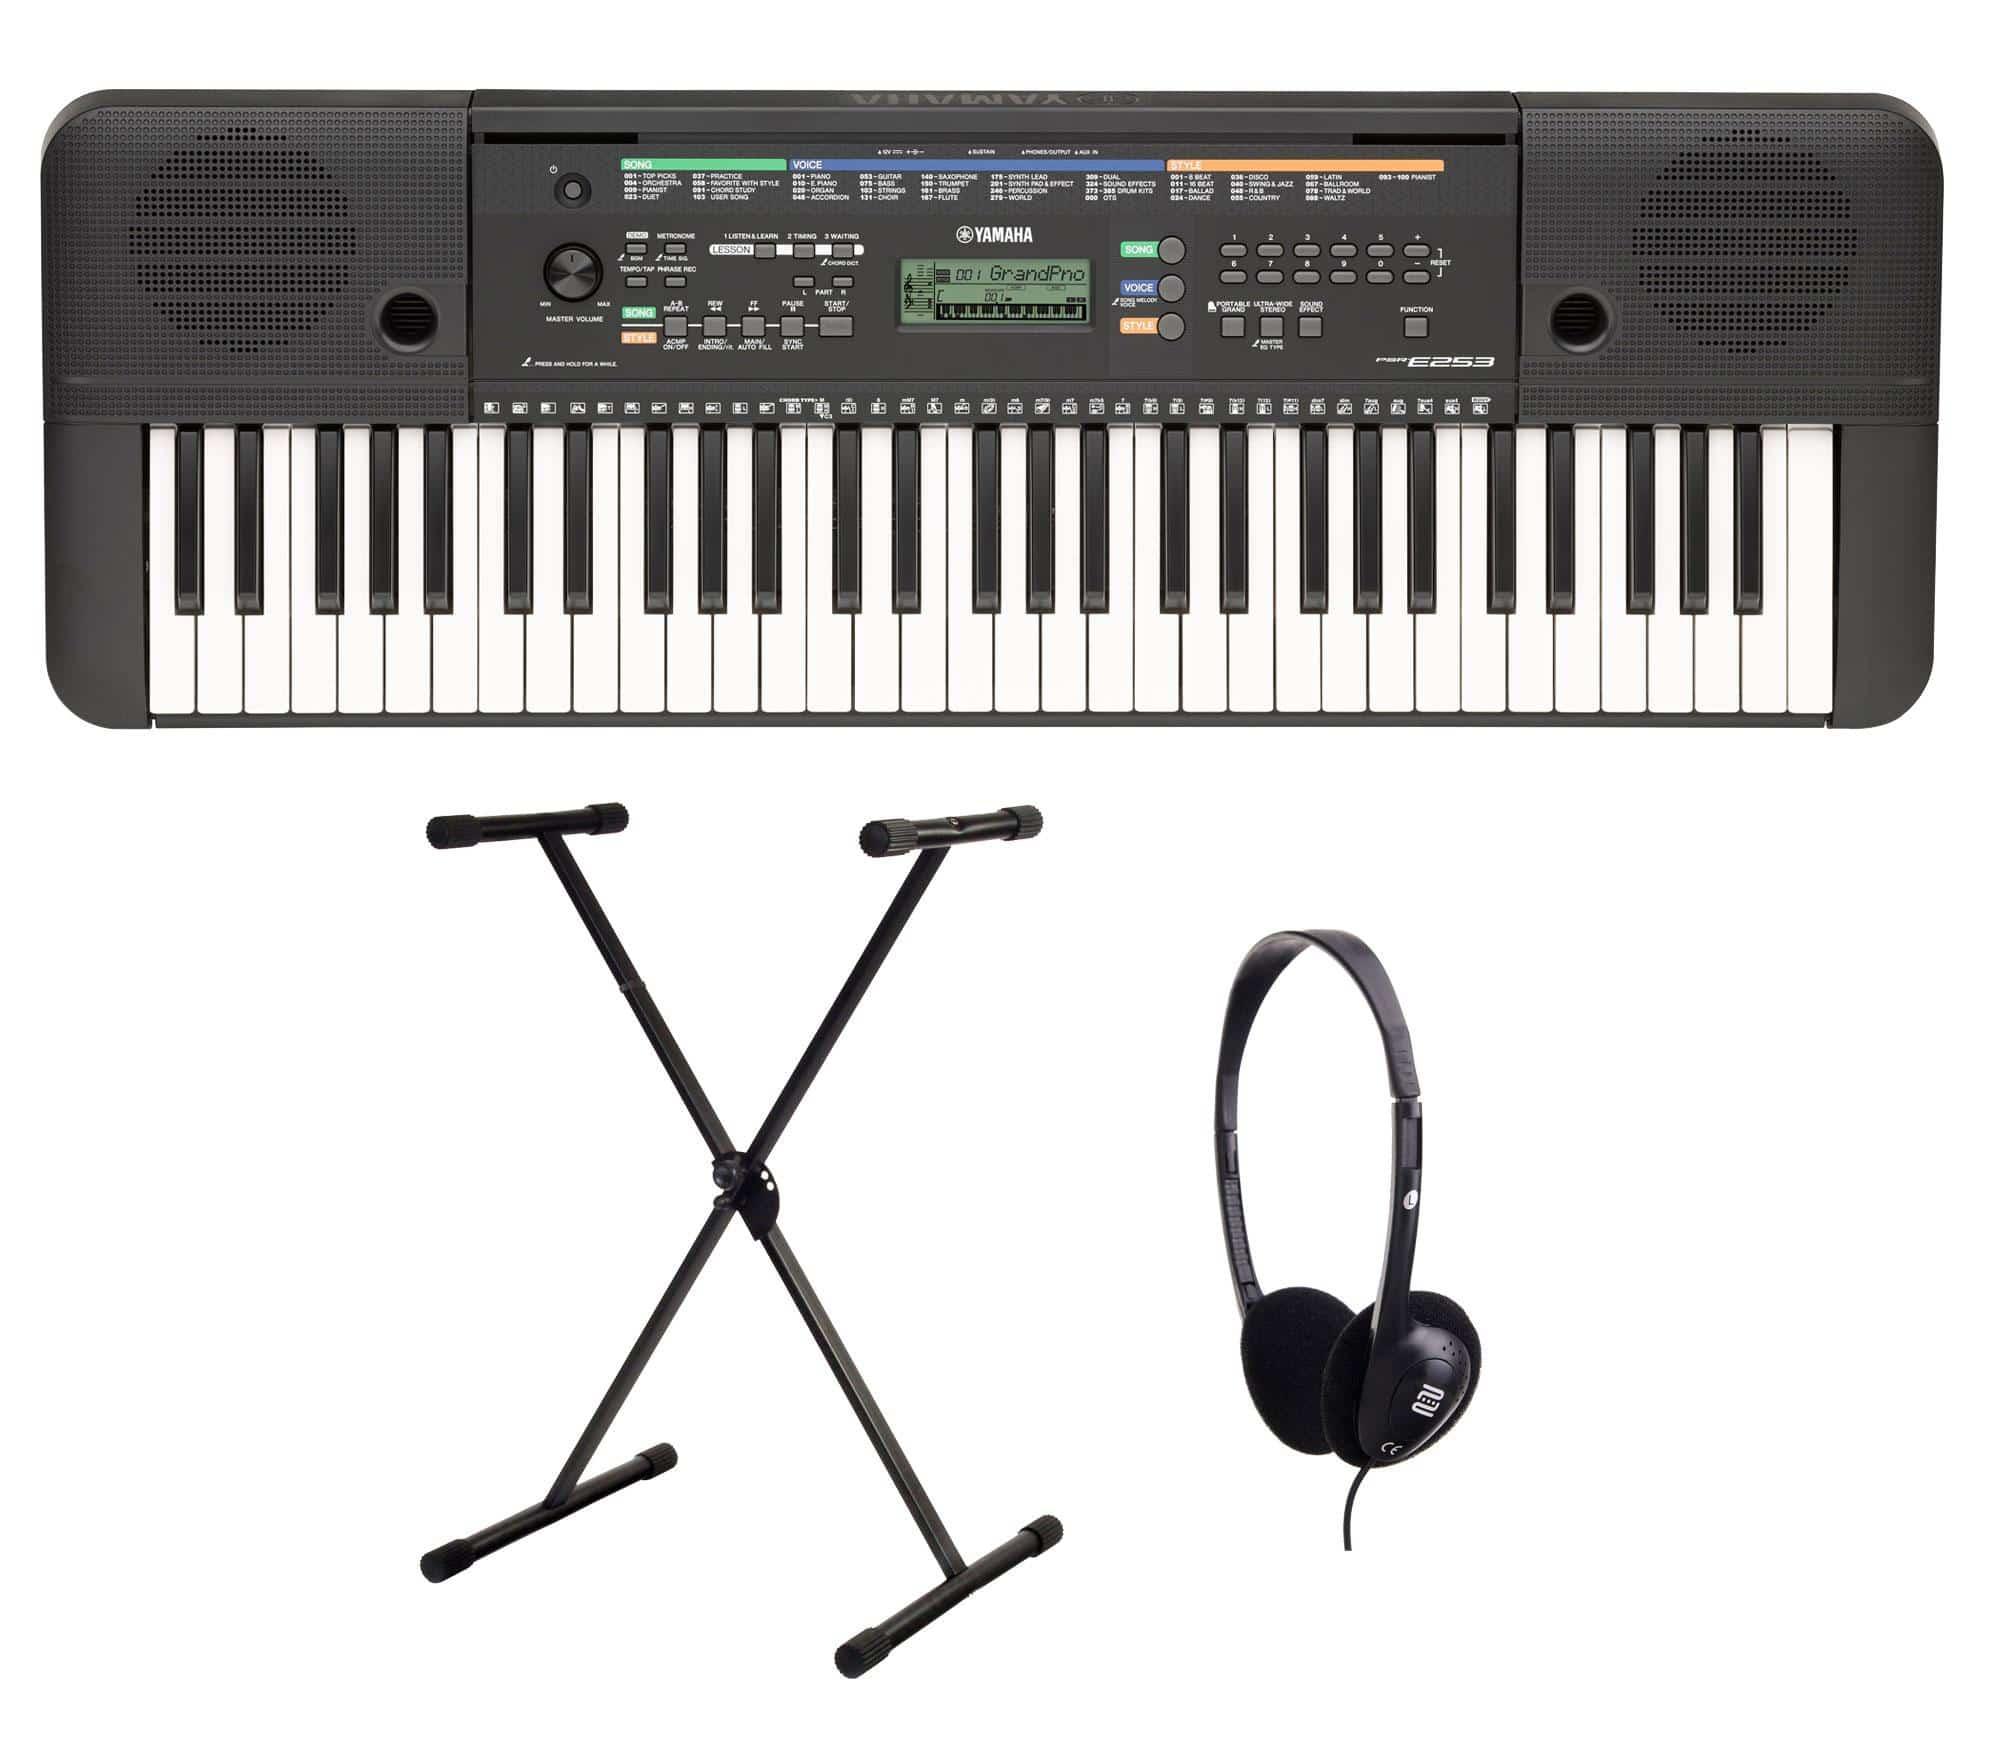 Yamaha PSR E253 Keyboard SET inkl. Ständer und Kopfhörer PSR-E253 Set